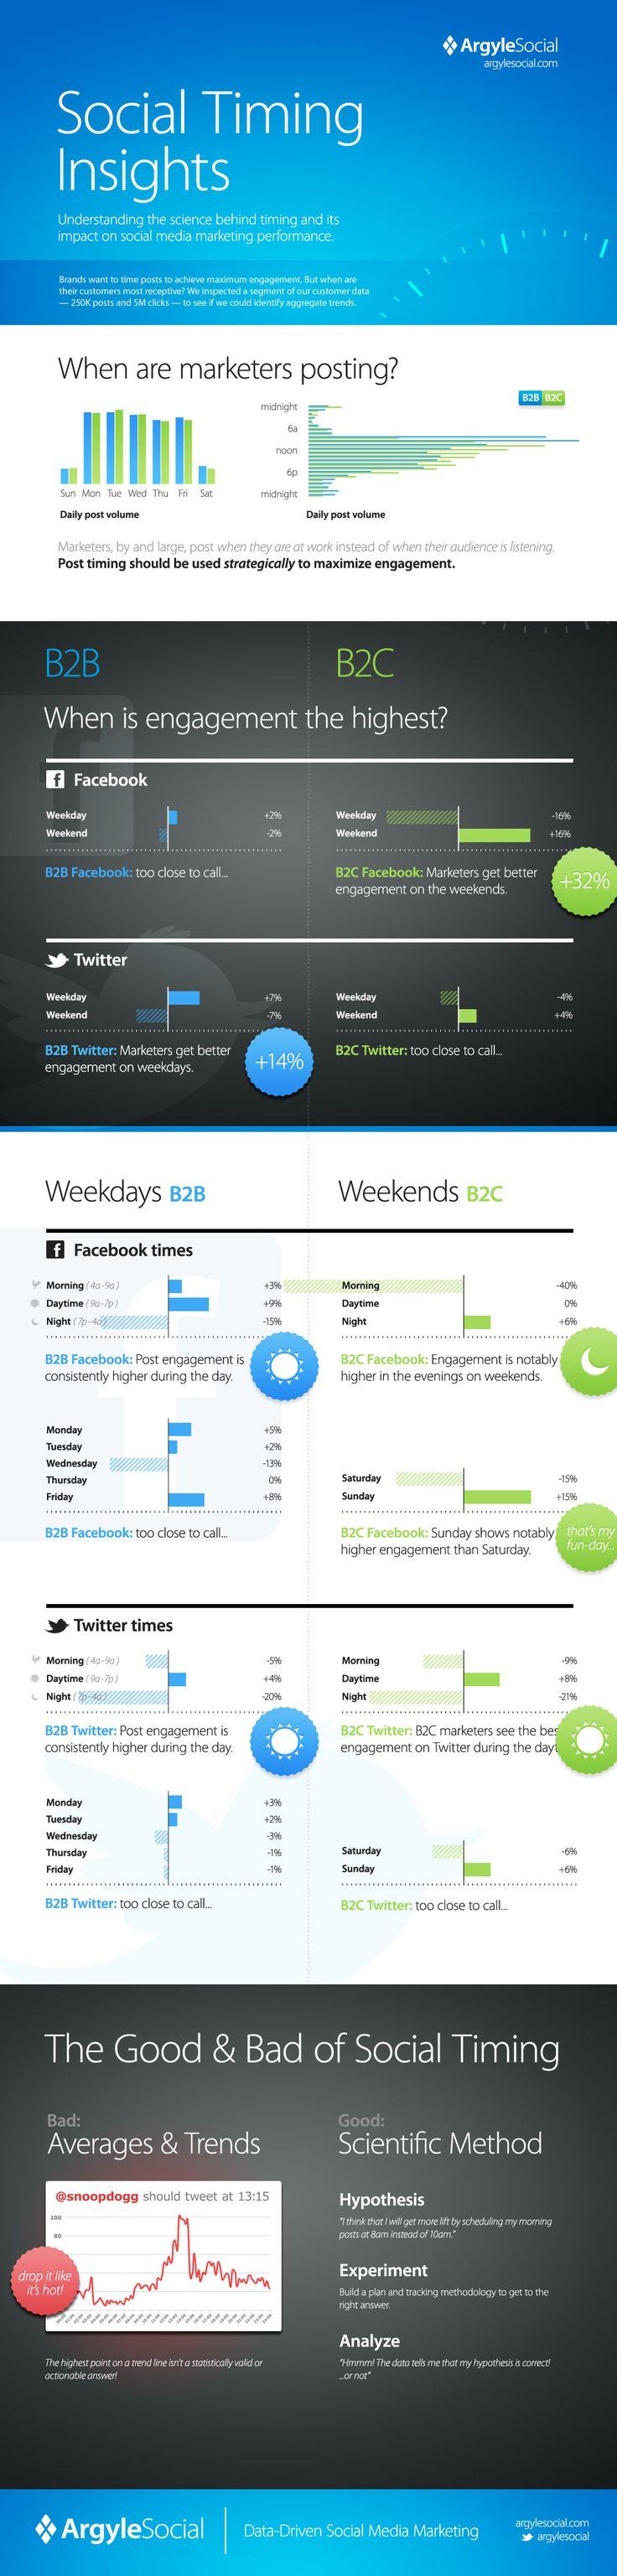 Social Timing Insights from Argyle Social: Time Insight, Social Network, Social Marketing, Social Media Marketing, Website, Web Site, Social Time, Infographic, Socialmedia